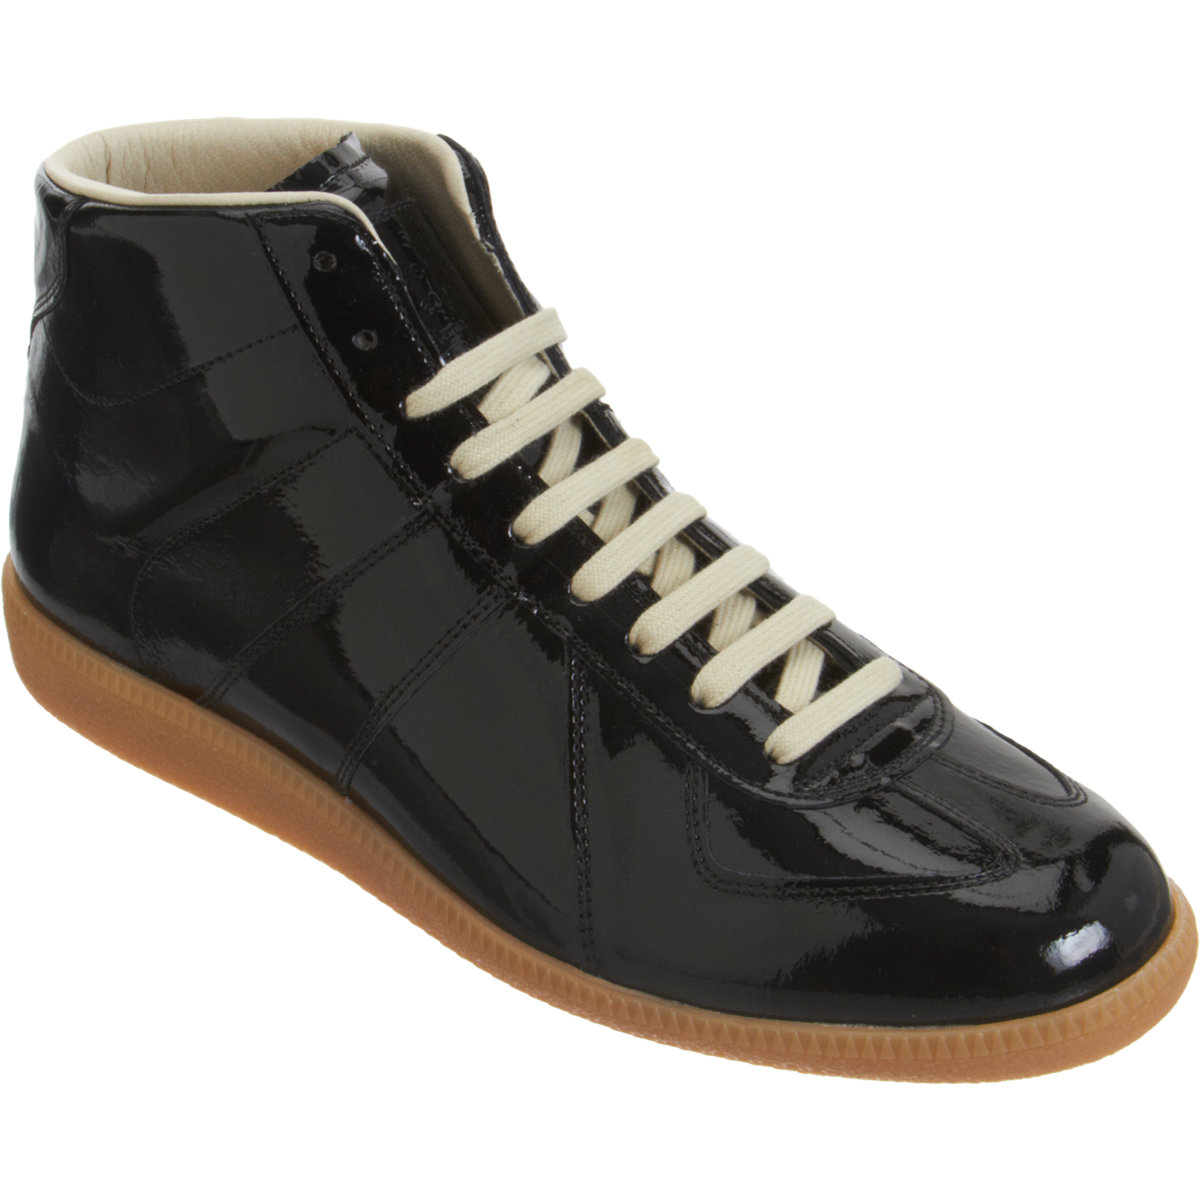 maison martin margiela patent high top sneaker in black for men lyst. Black Bedroom Furniture Sets. Home Design Ideas